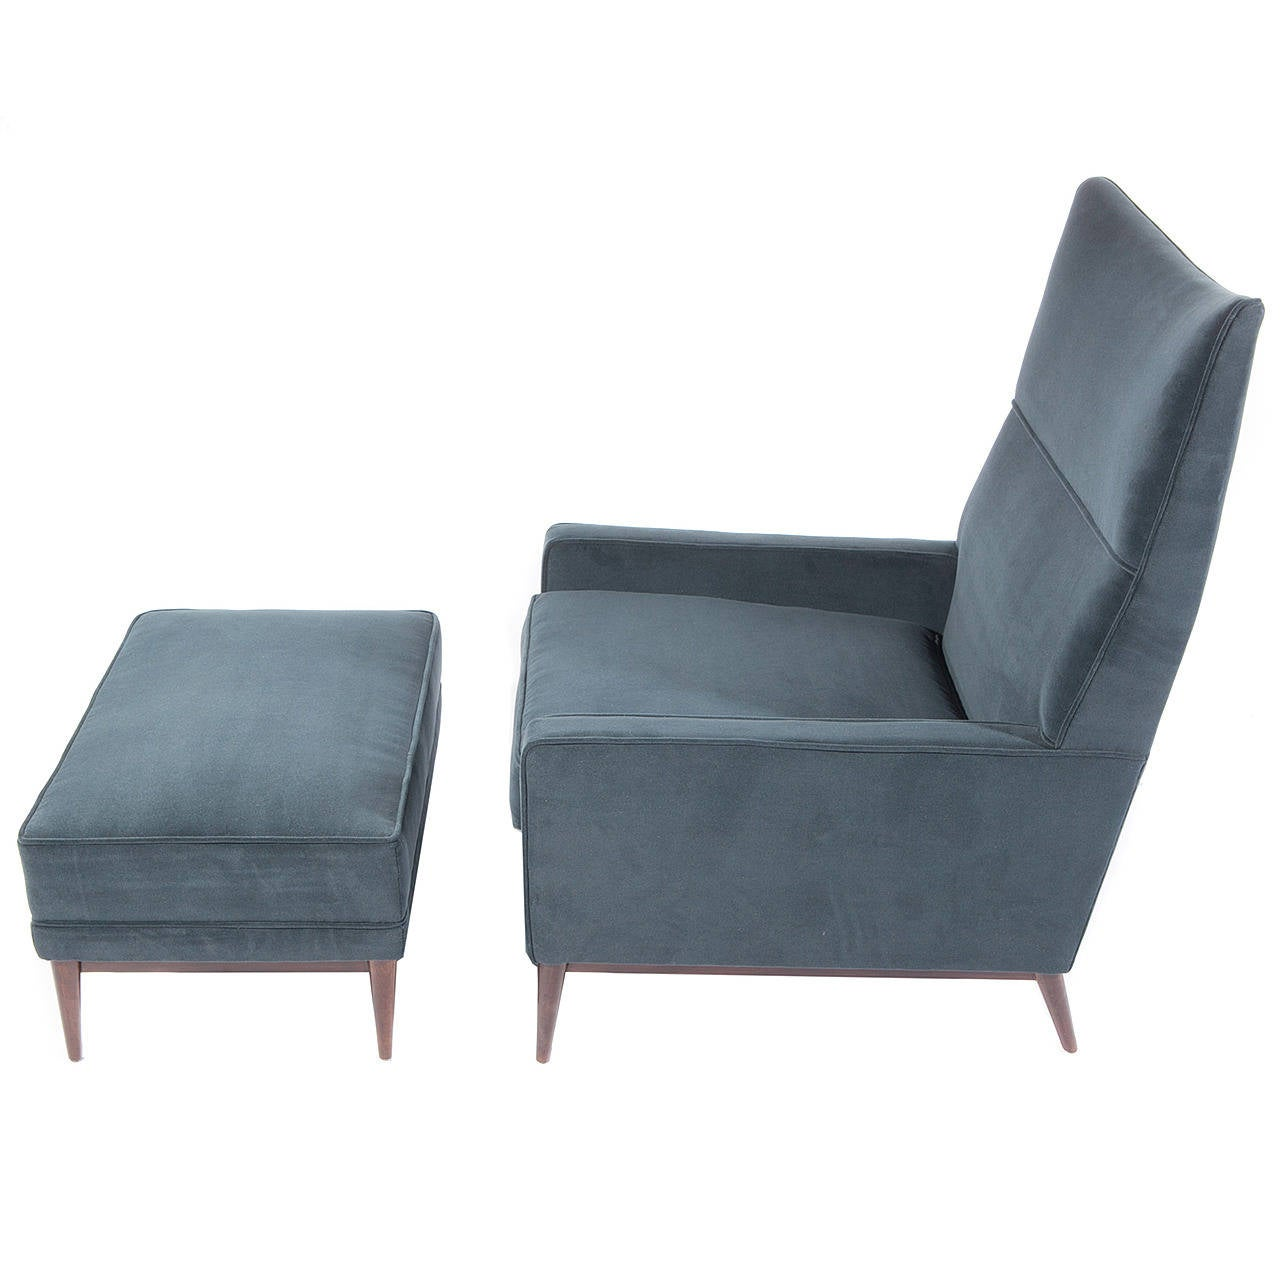 High back lounge chairs - Paul Mccobb High Back Lounge Chair And Ottoman 1